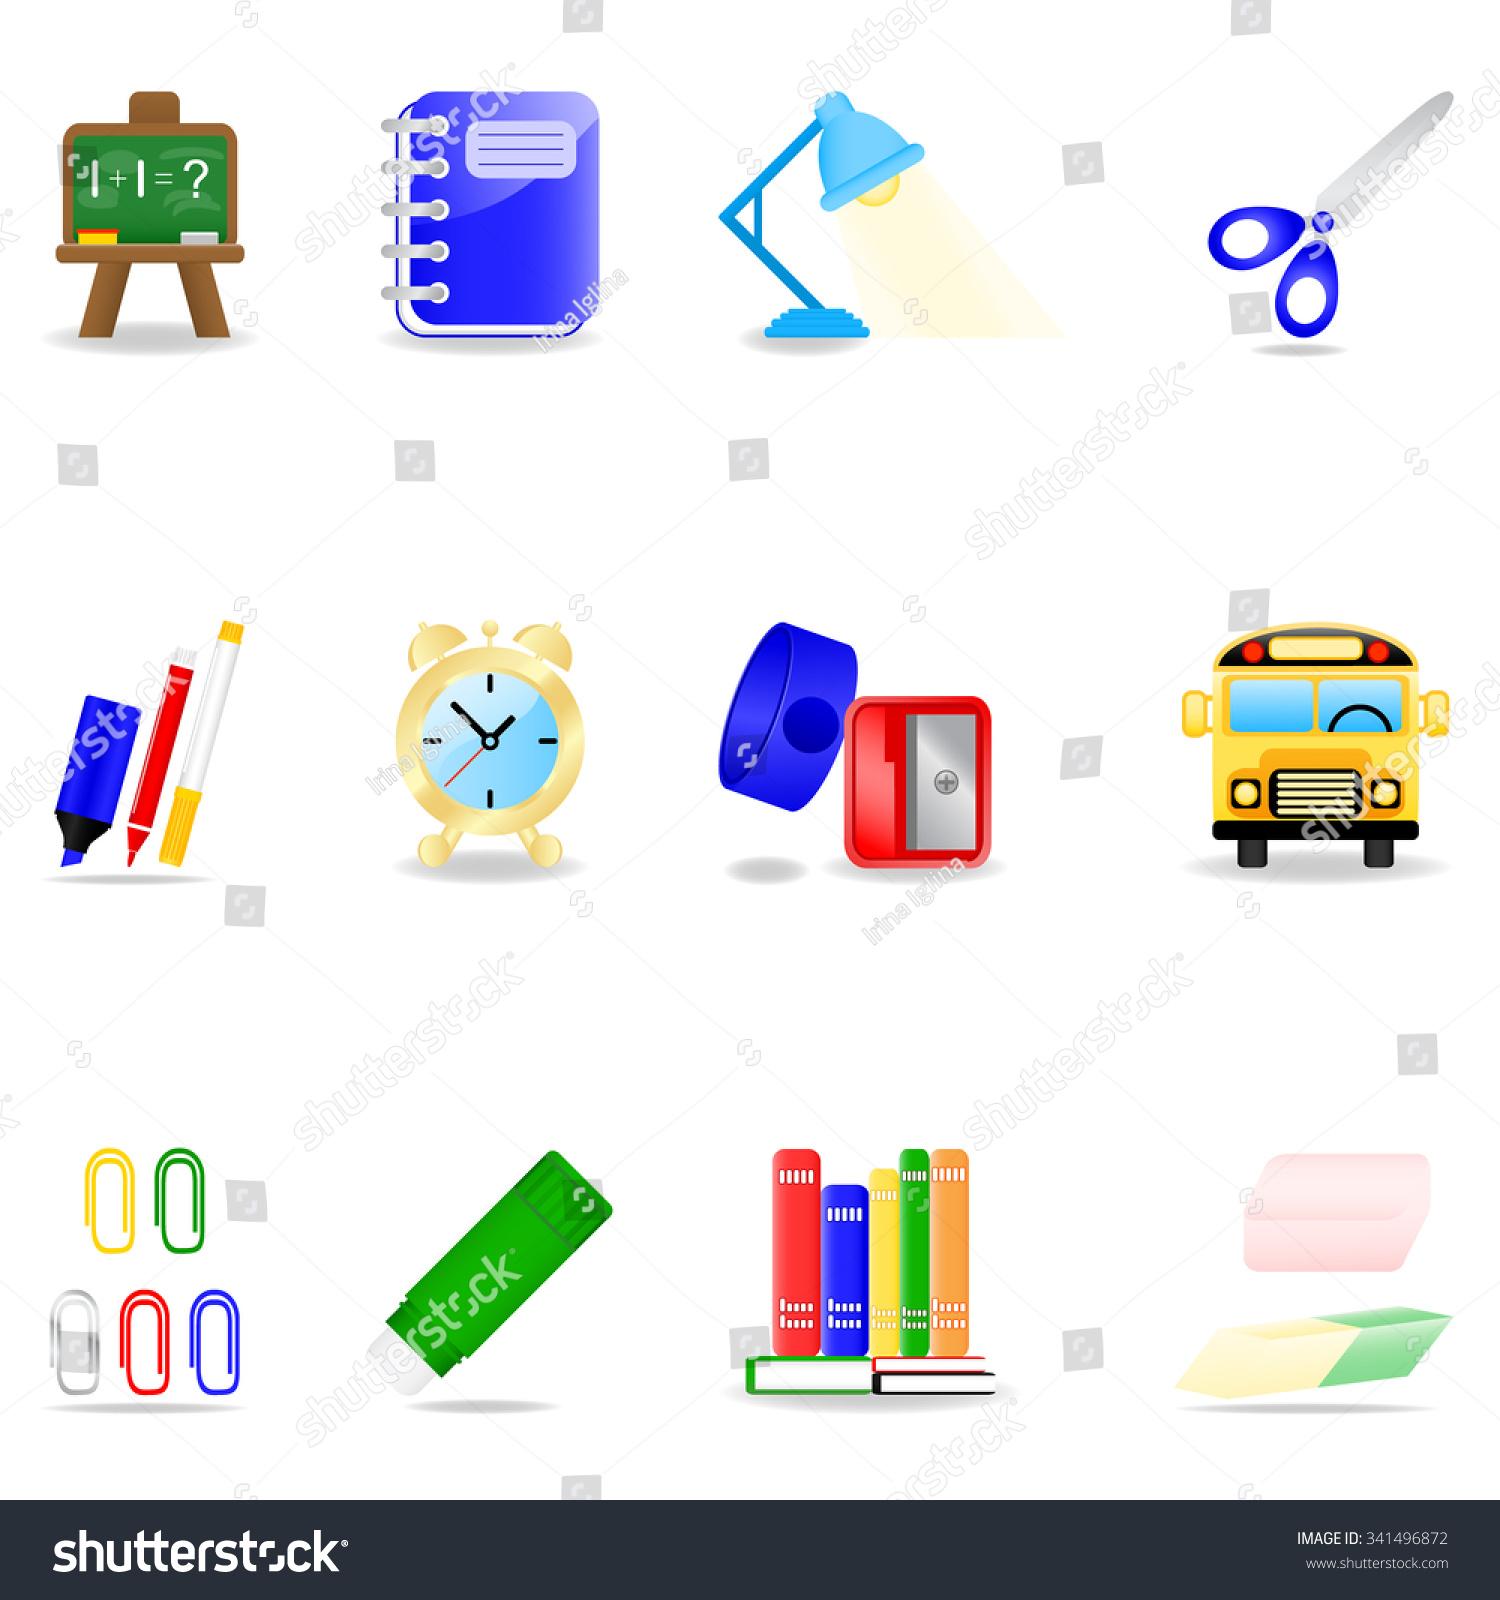 Icon set school symbols stock illustration 341496872 shutterstock icon set with school symbols buycottarizona Image collections